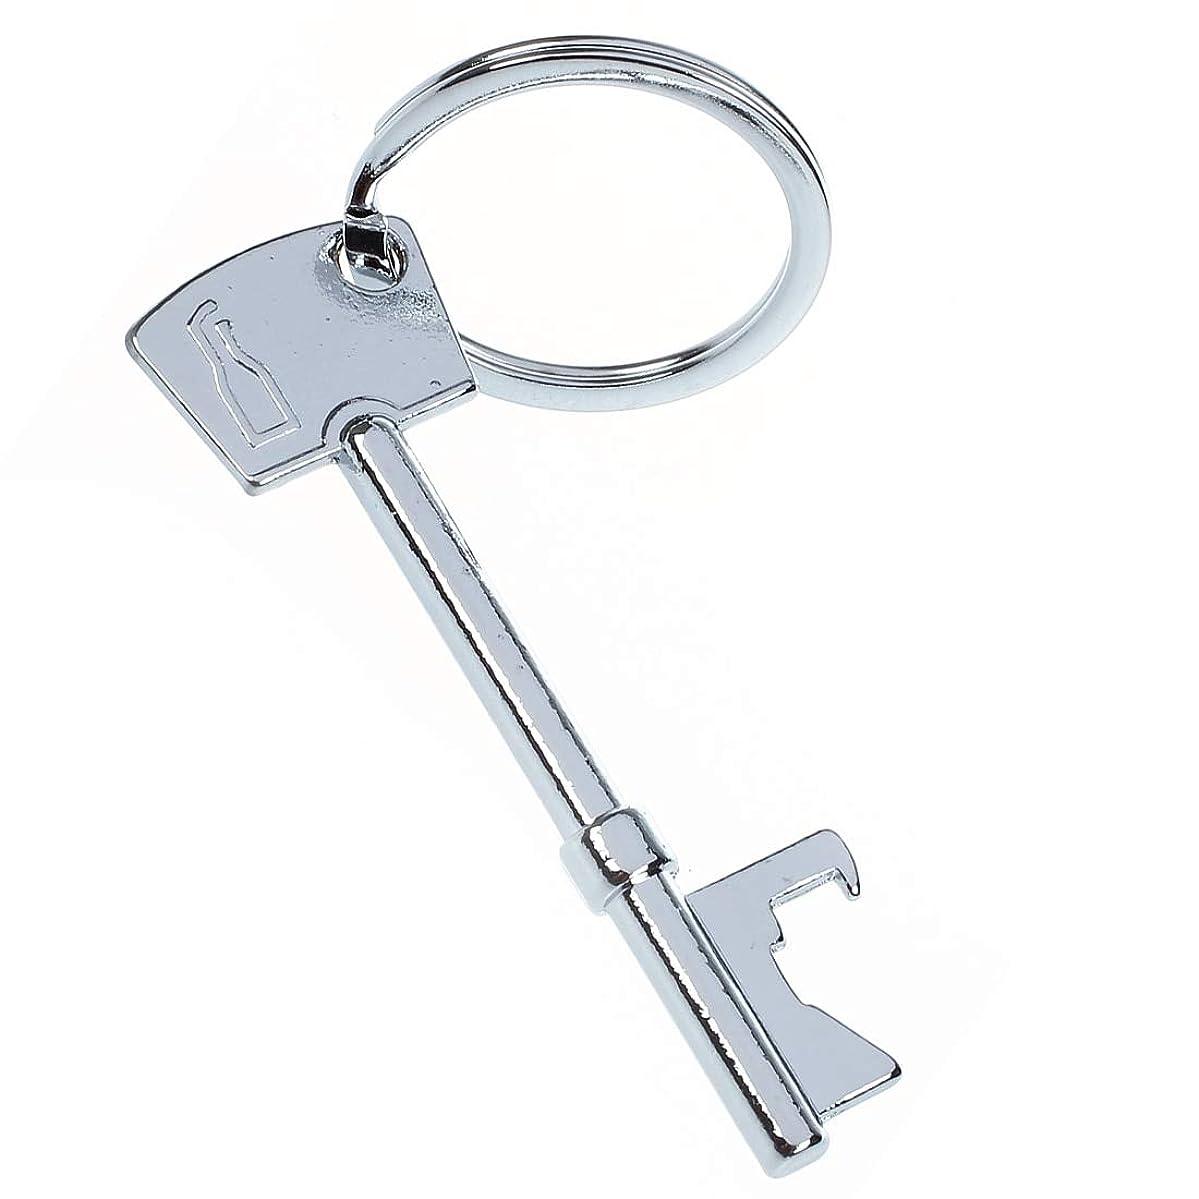 Openers - Beer Bottle Opener Key Ring Keychain Bar - Iphone Bottle Blank Light Zelda Gift Irish Cute Launcher Buckle Mounted Black Eagles Small Earrings Tool Wars Wallet Outdoor Chain